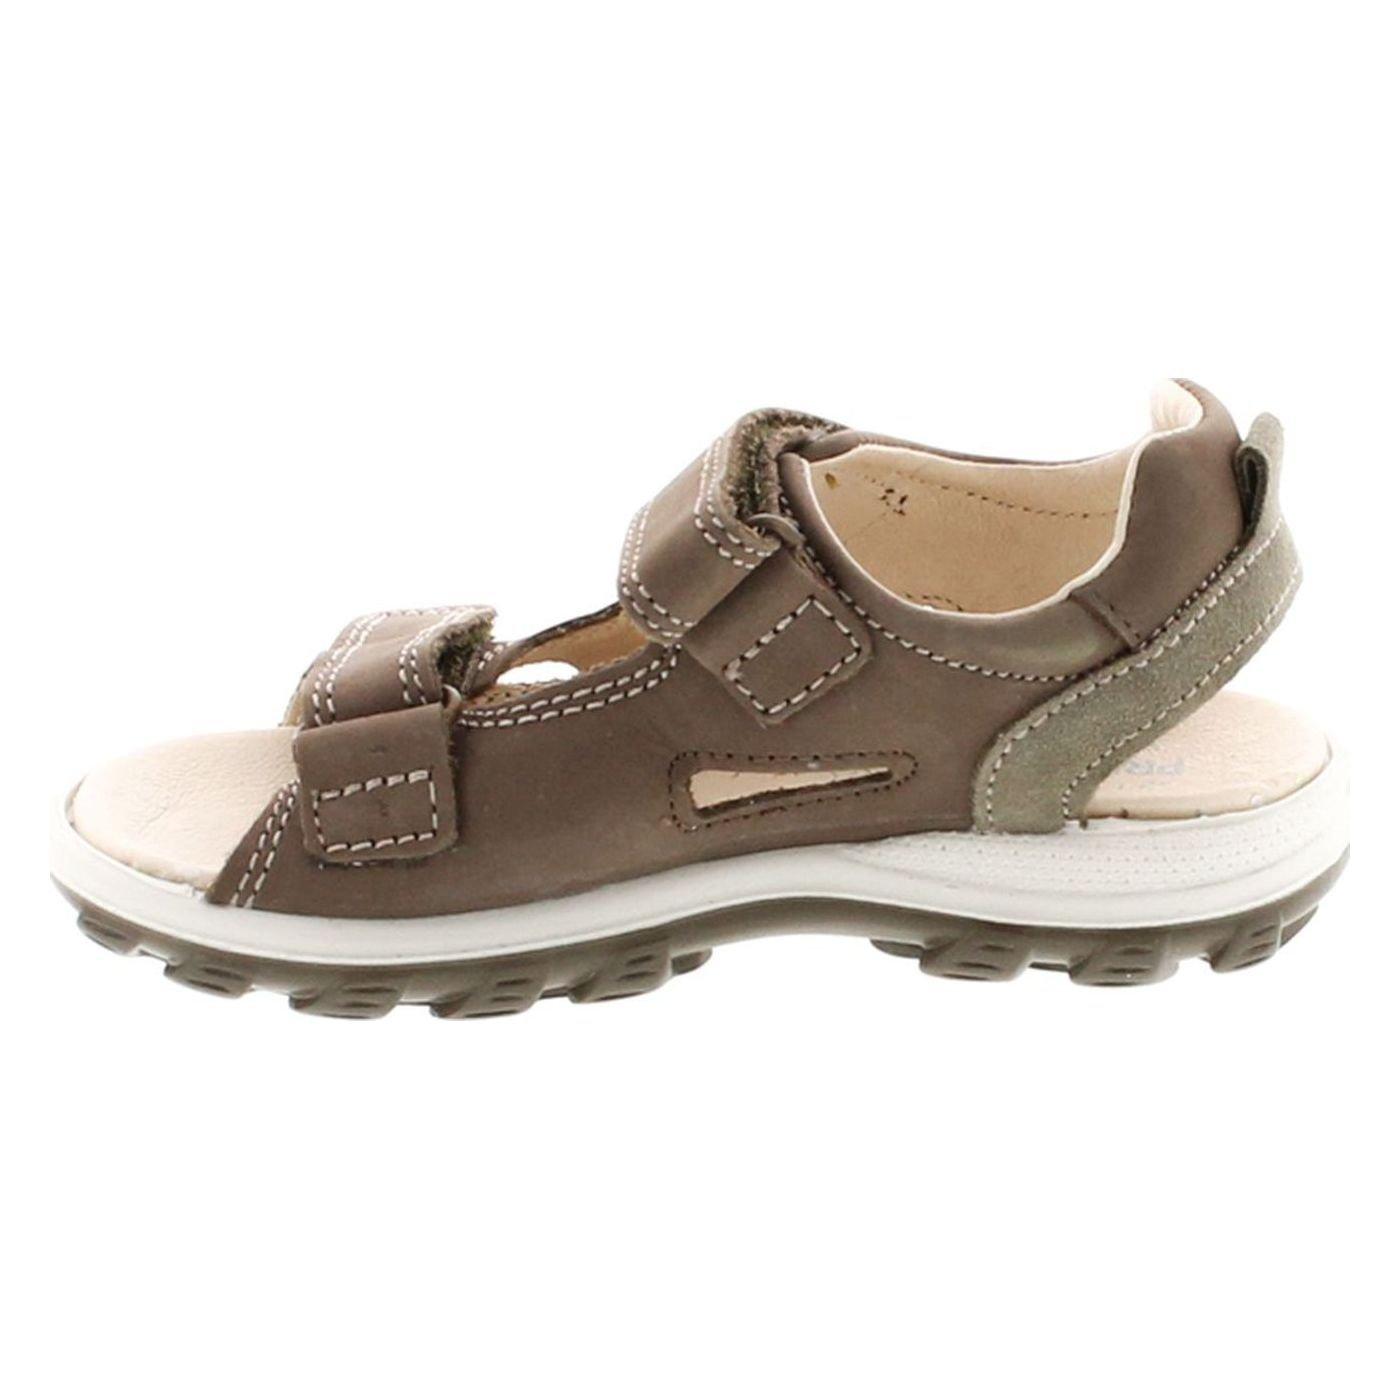 Primigi Boys 13944 Leather European Double Adjustable Fashion Sandals